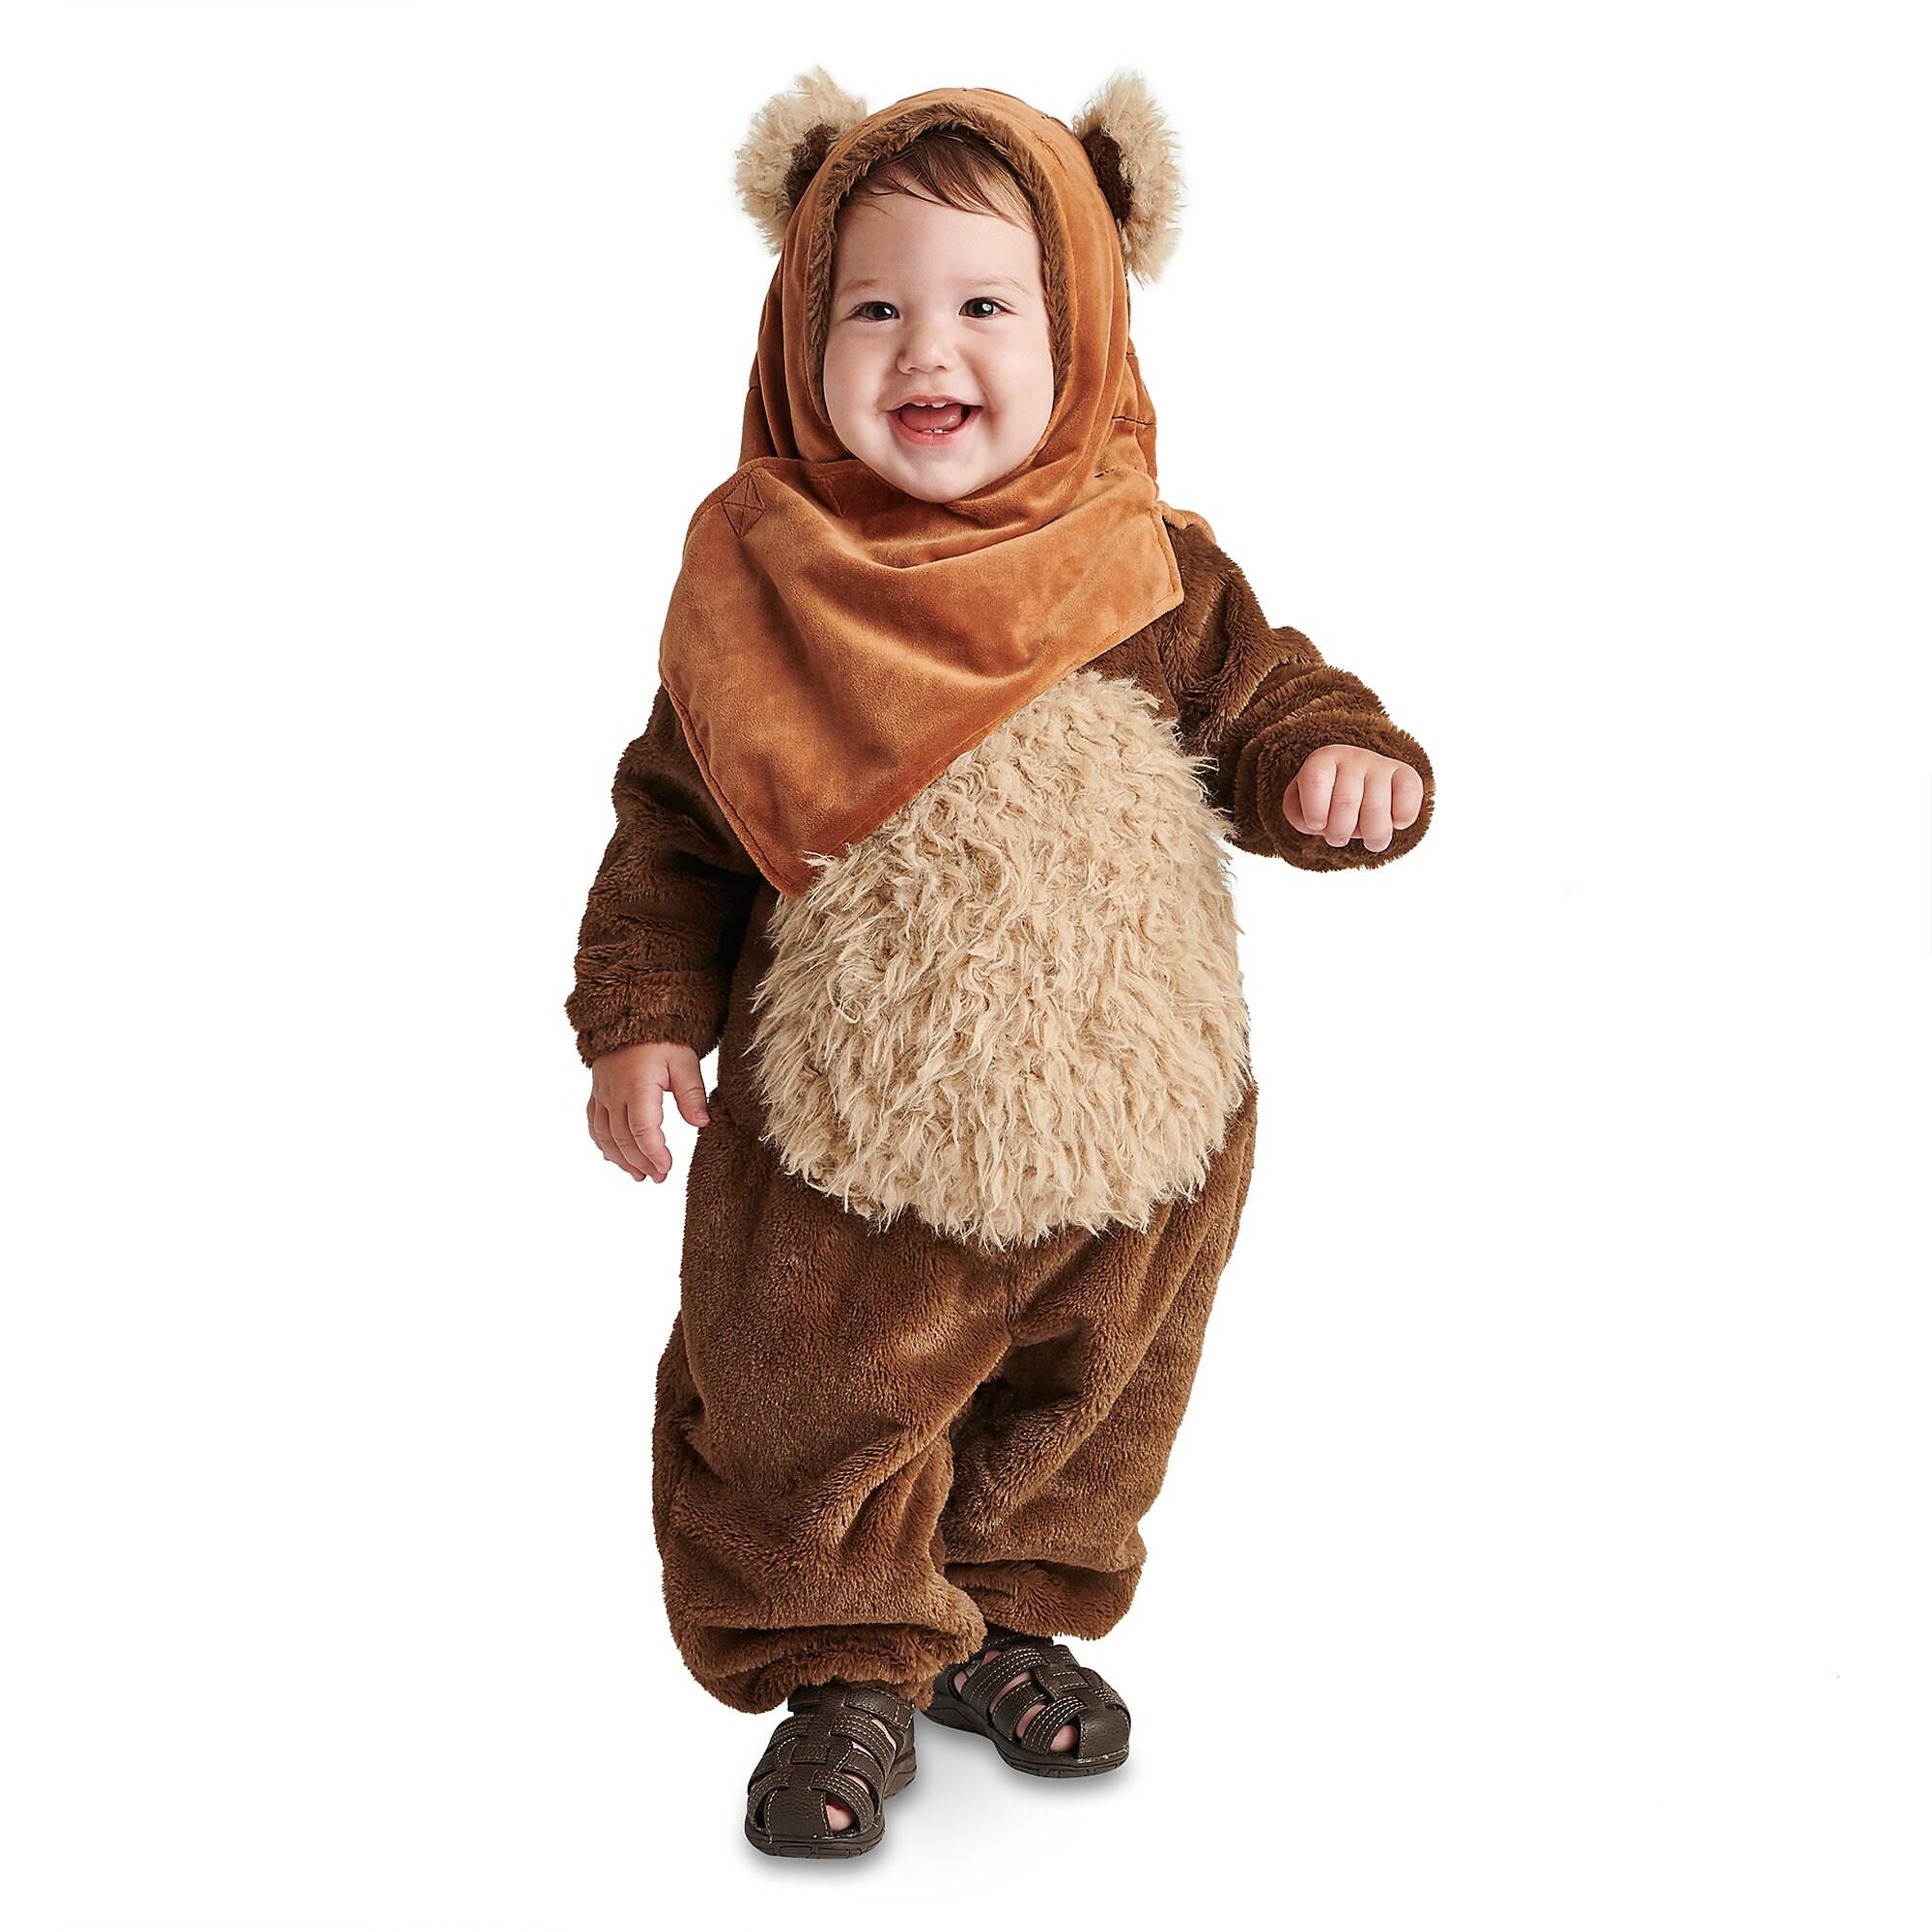 Thumbnail Image of Ewok Costume for Baby - Star Wars # 1  sc 1 st  shopDisney & Ewok Costume for Baby - Star Wars | shopDisney